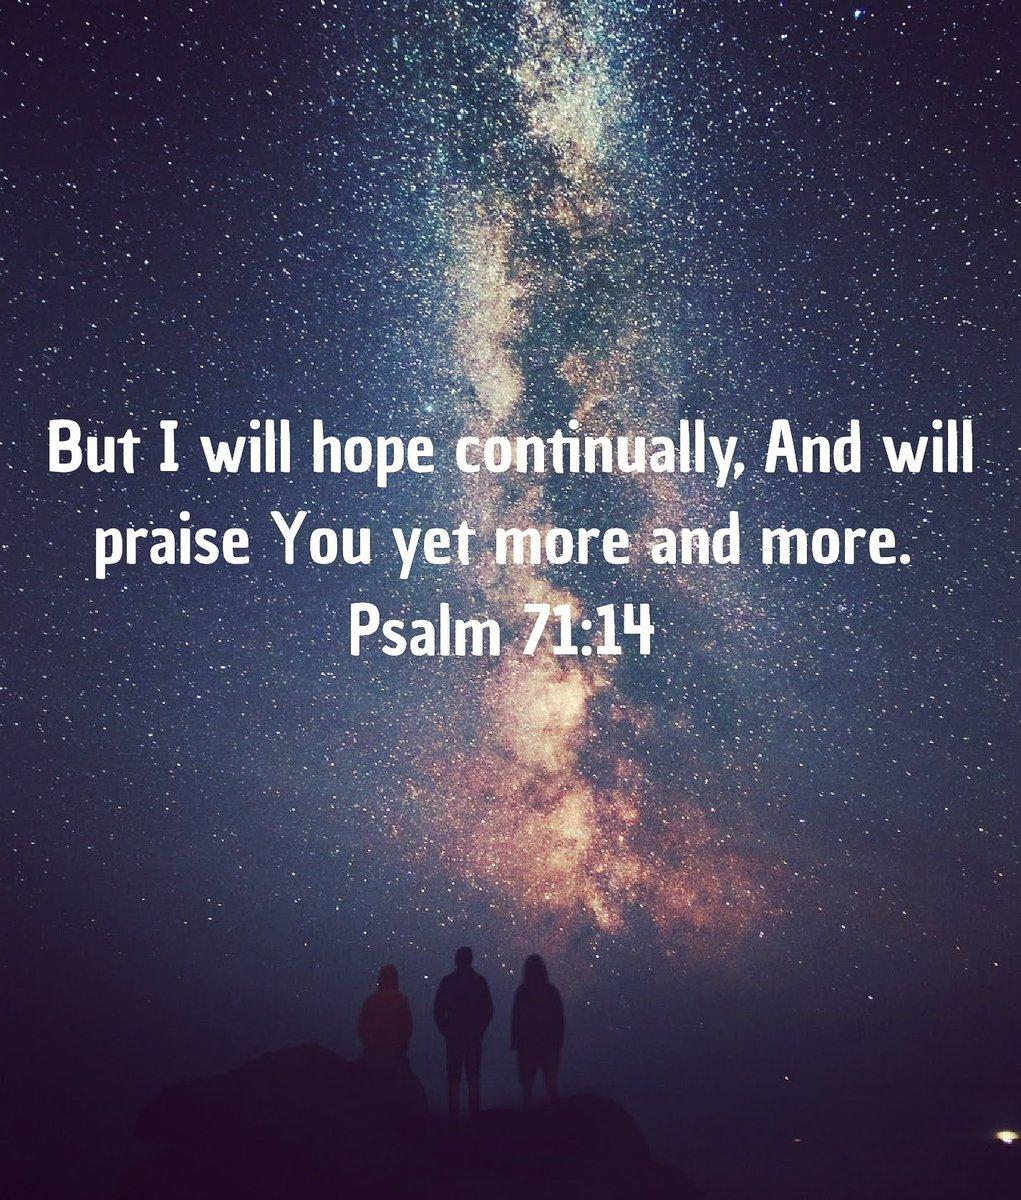 #ThursdayThoughts #ThursdayMotivation #ThankfulThursday #Bible #TrustGod